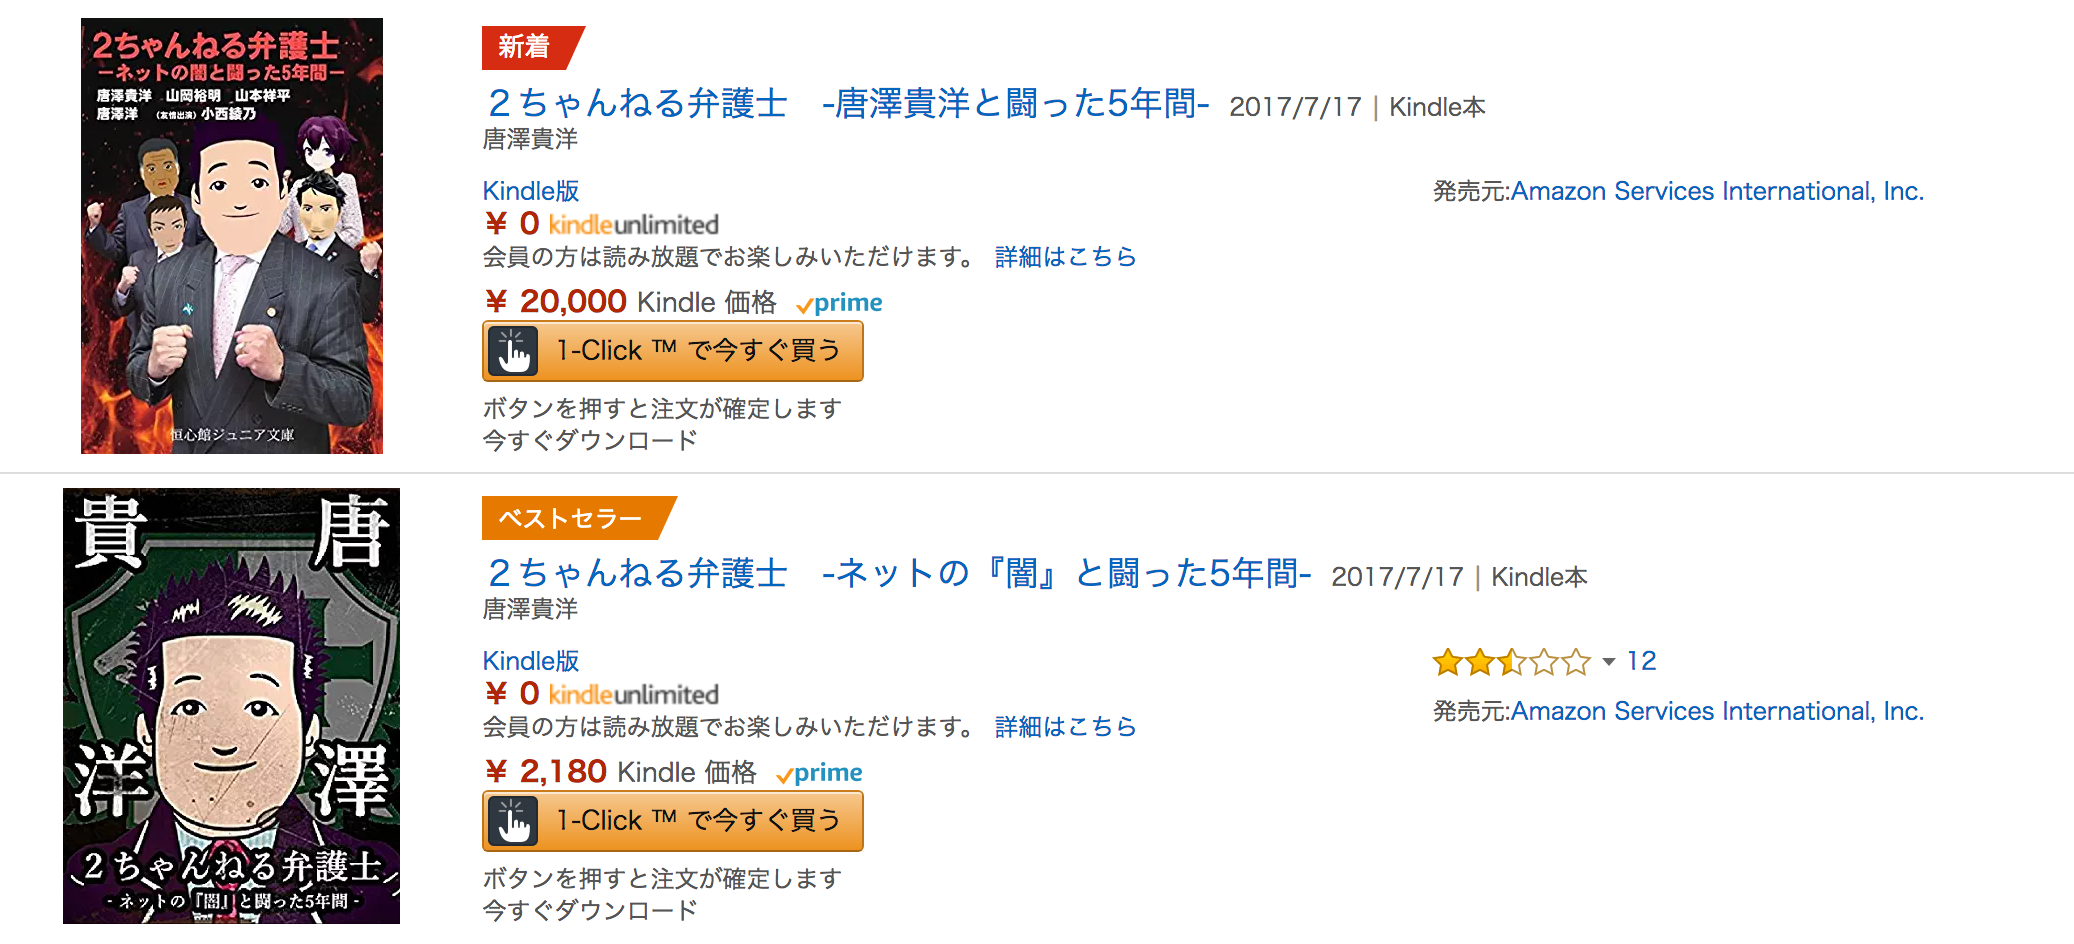 jp_s_ref=nb_sb_noss_1